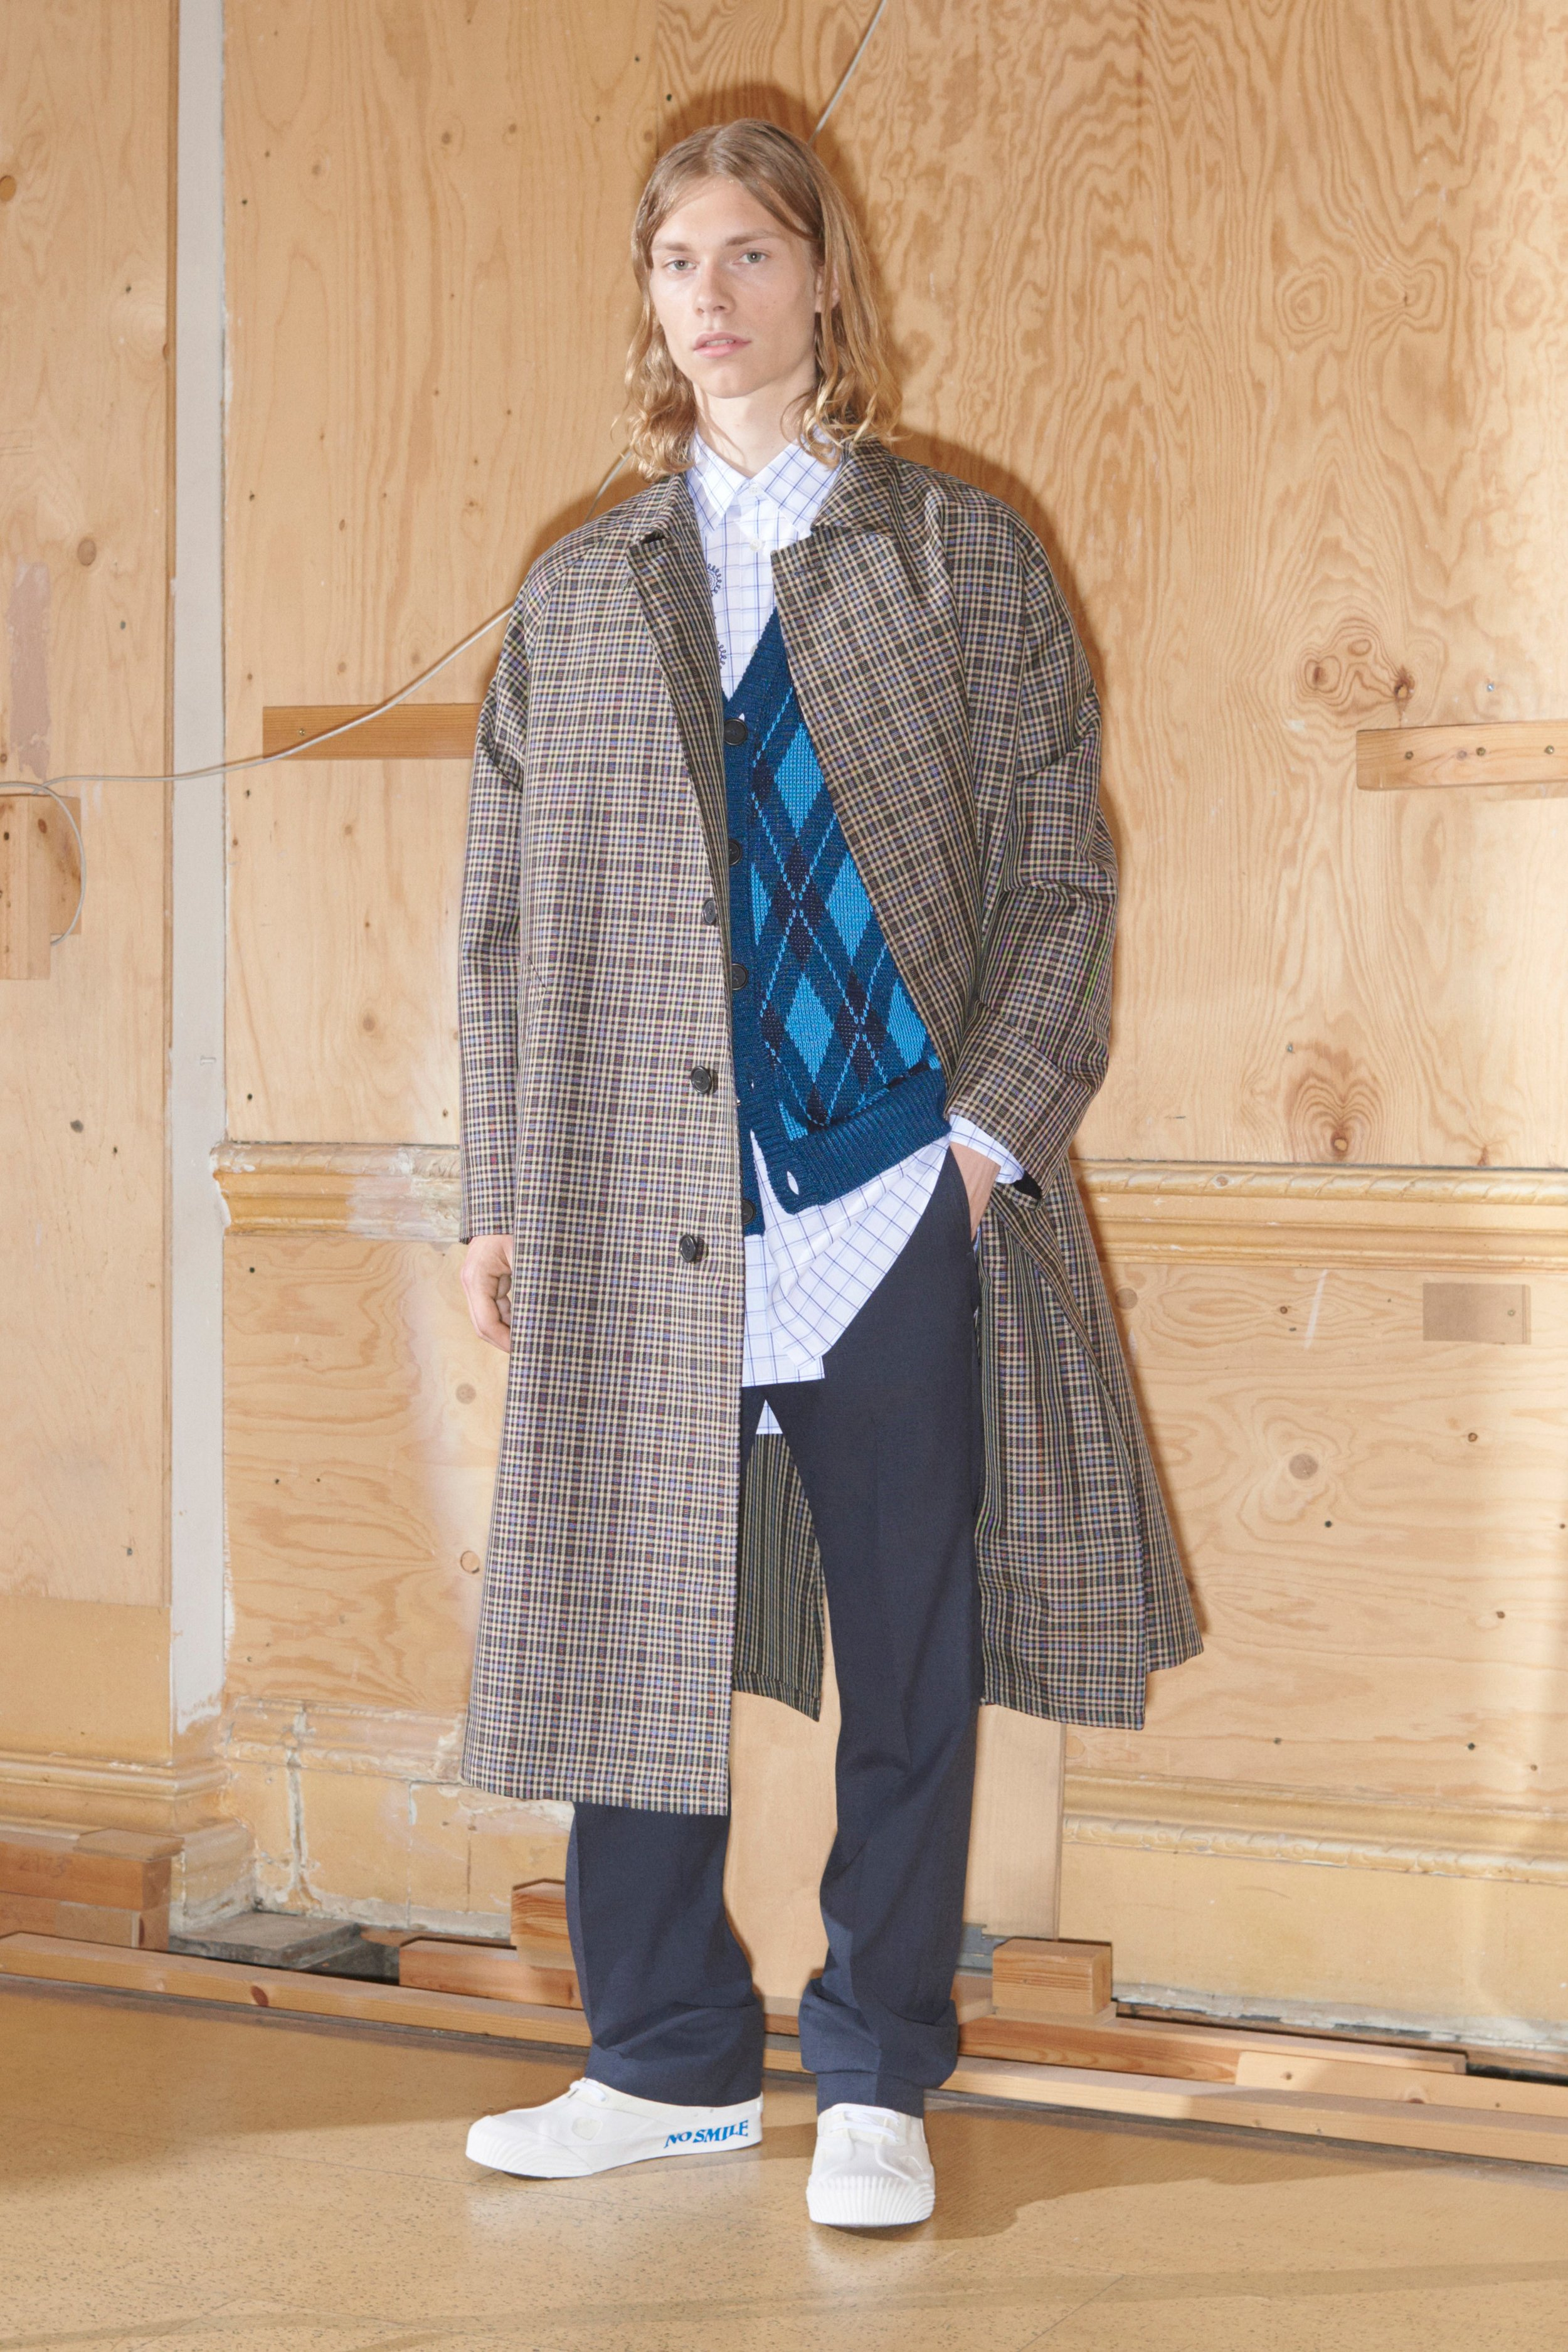 stella mccartney spring 2019 menswear